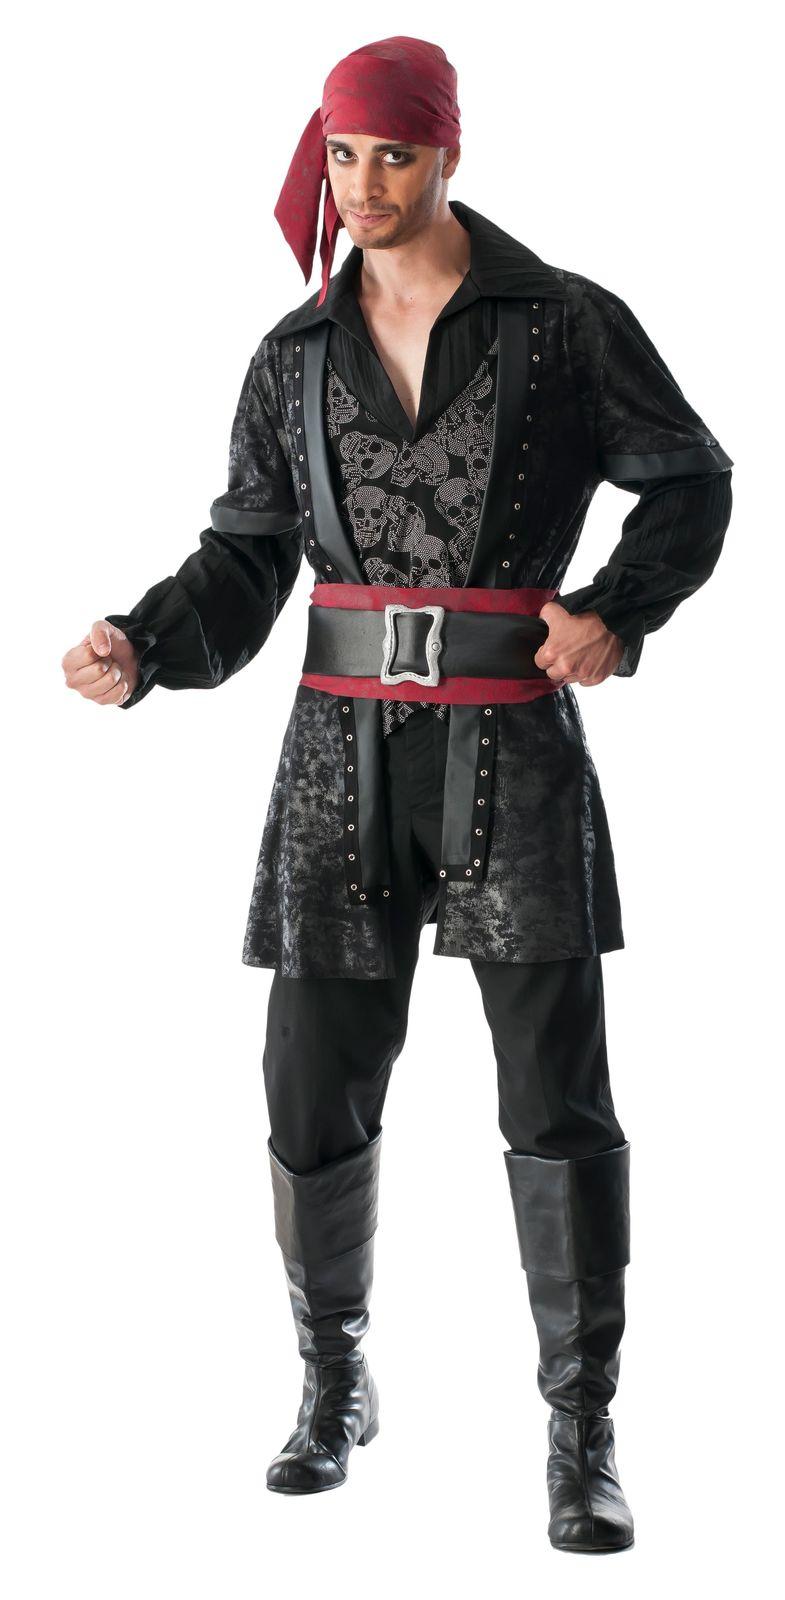 Rubie's: Black Beard - Deluxe Costume (Medium) image